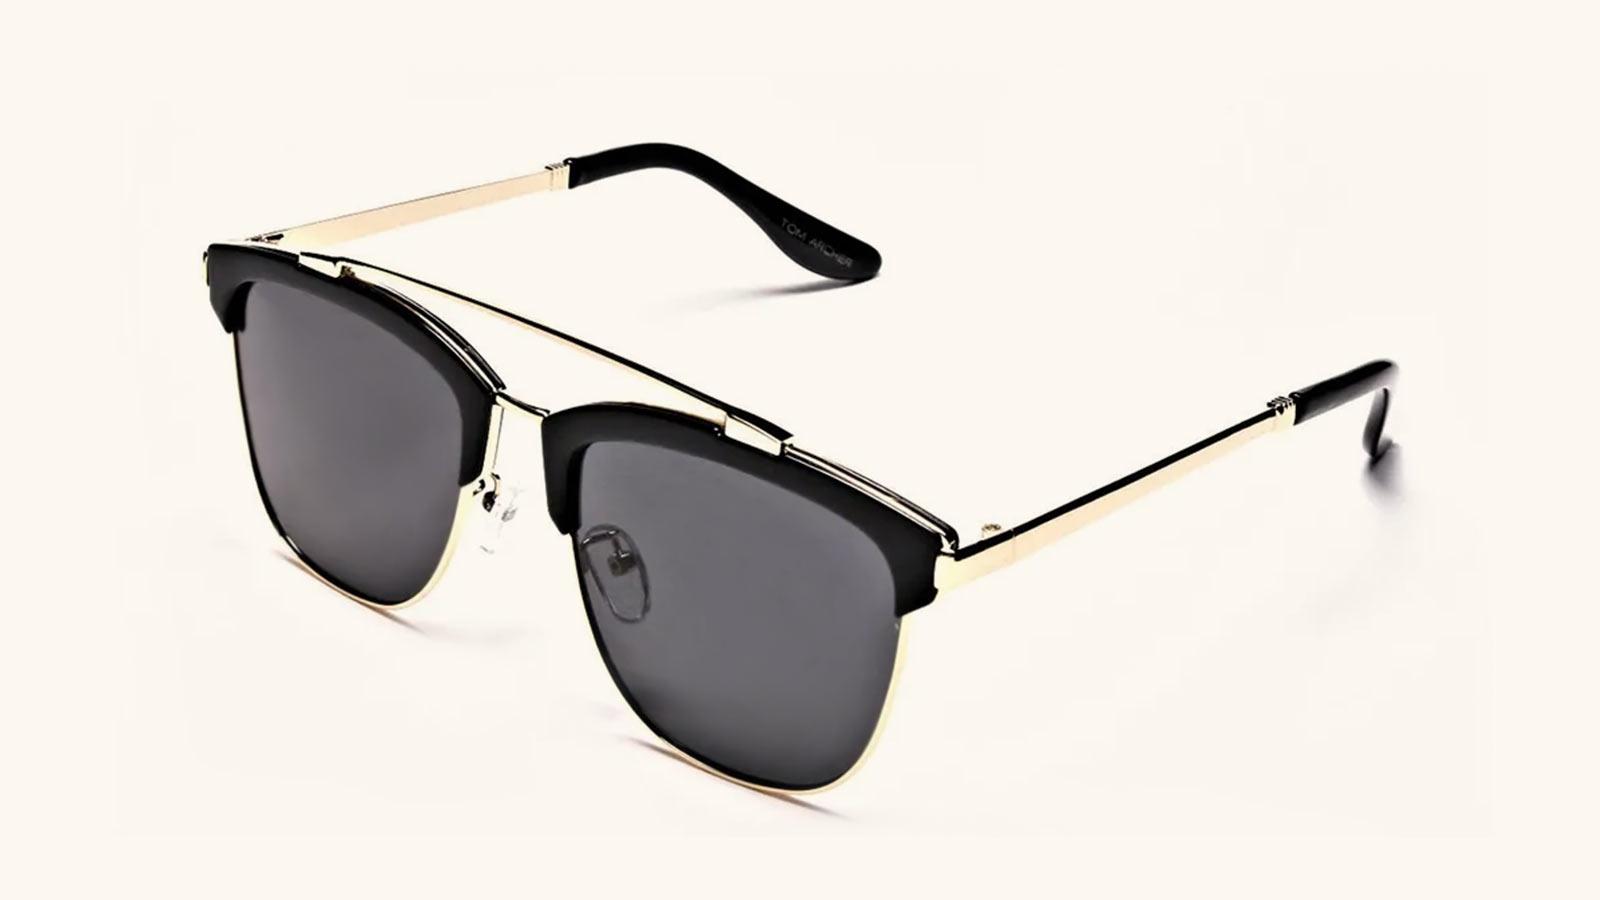 Browline aviator sunglasses for travel